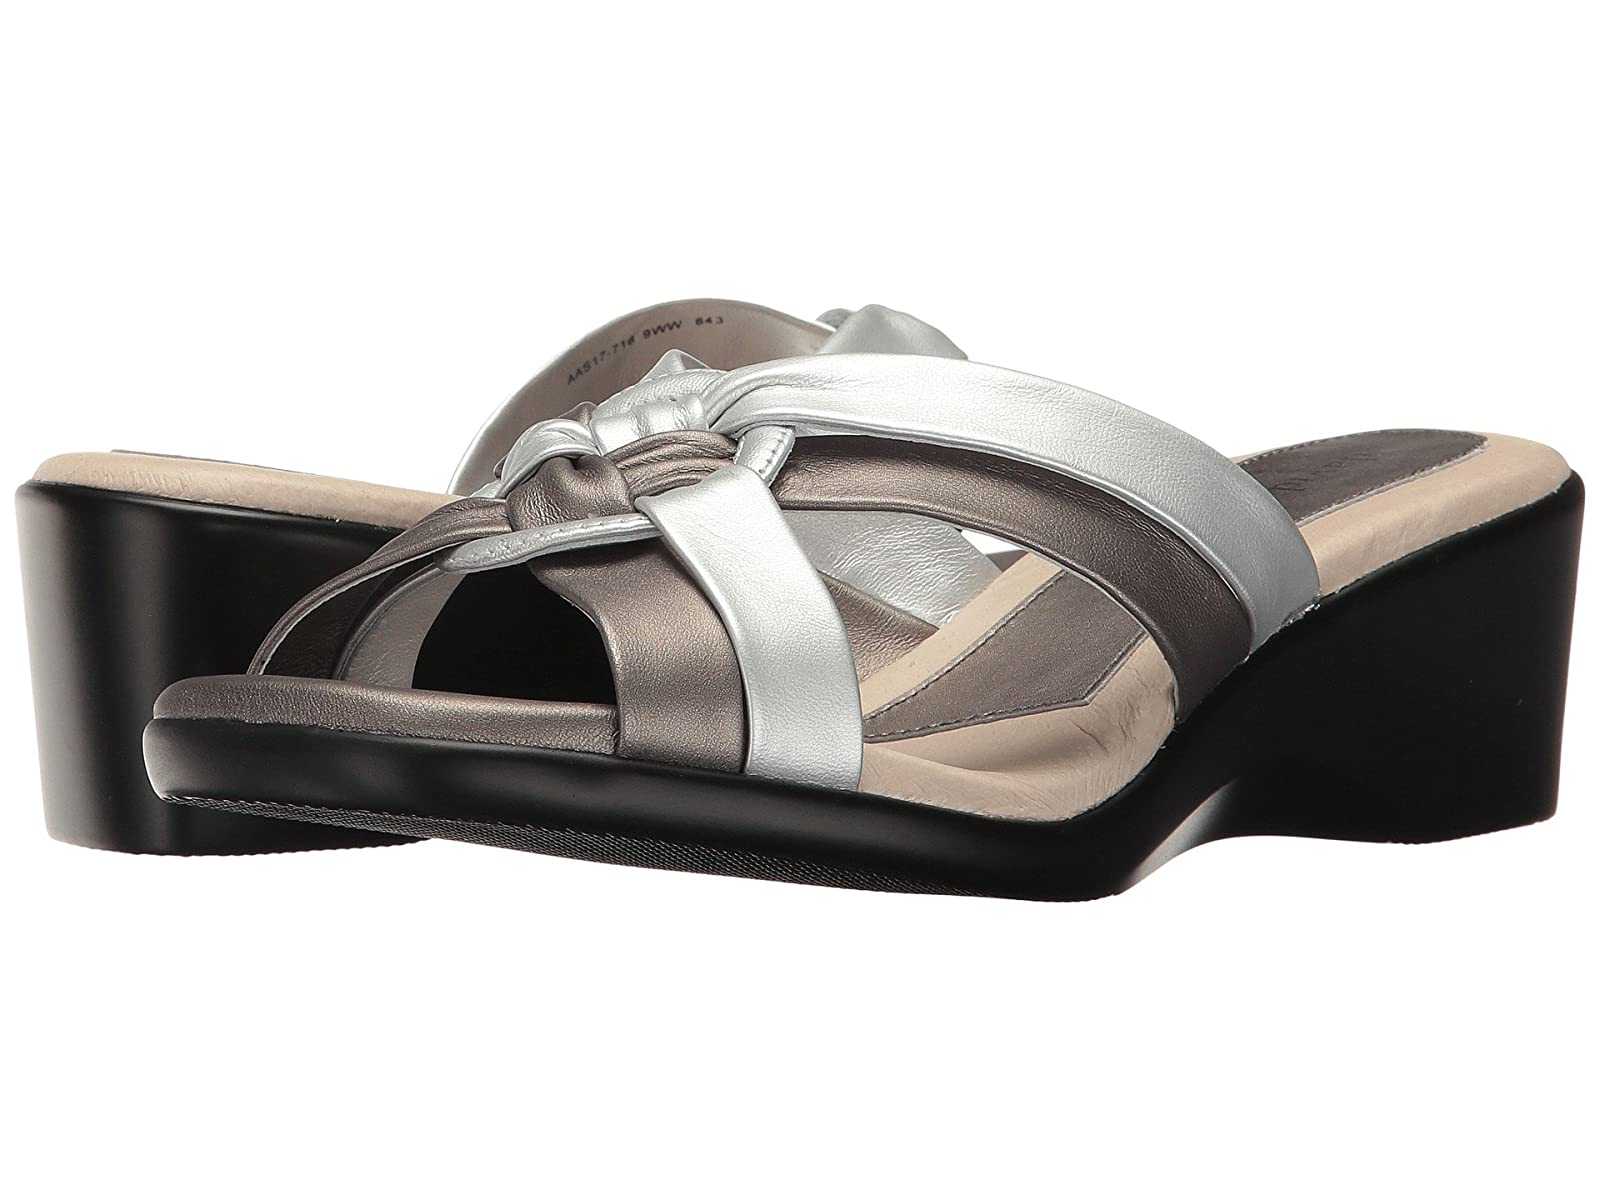 David Tate VeronaCheap and distinctive eye-catching shoes